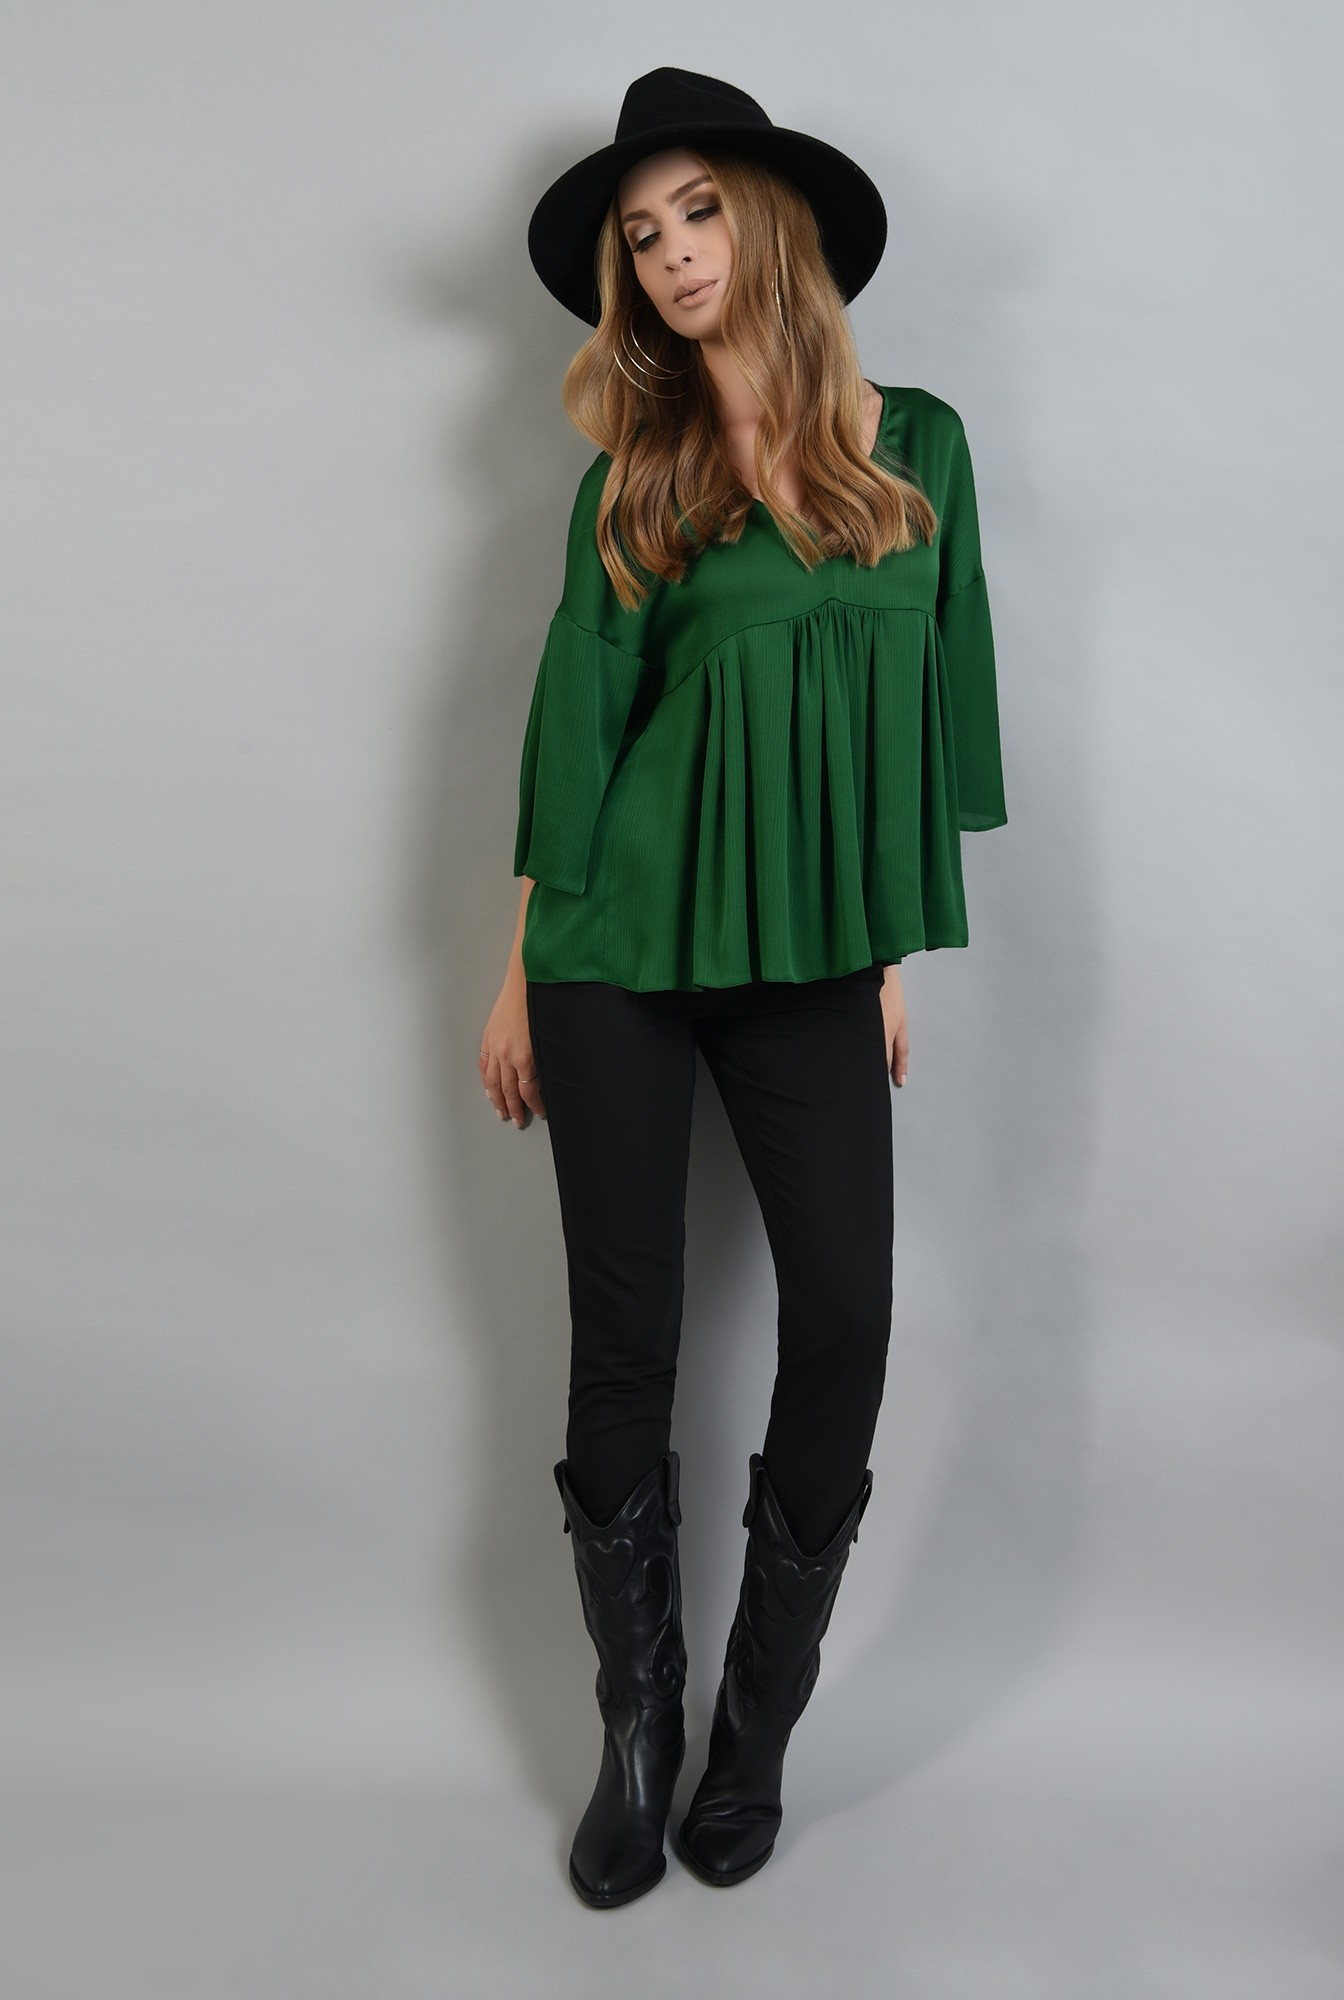 0 - bluza larga, verde, cu peplum